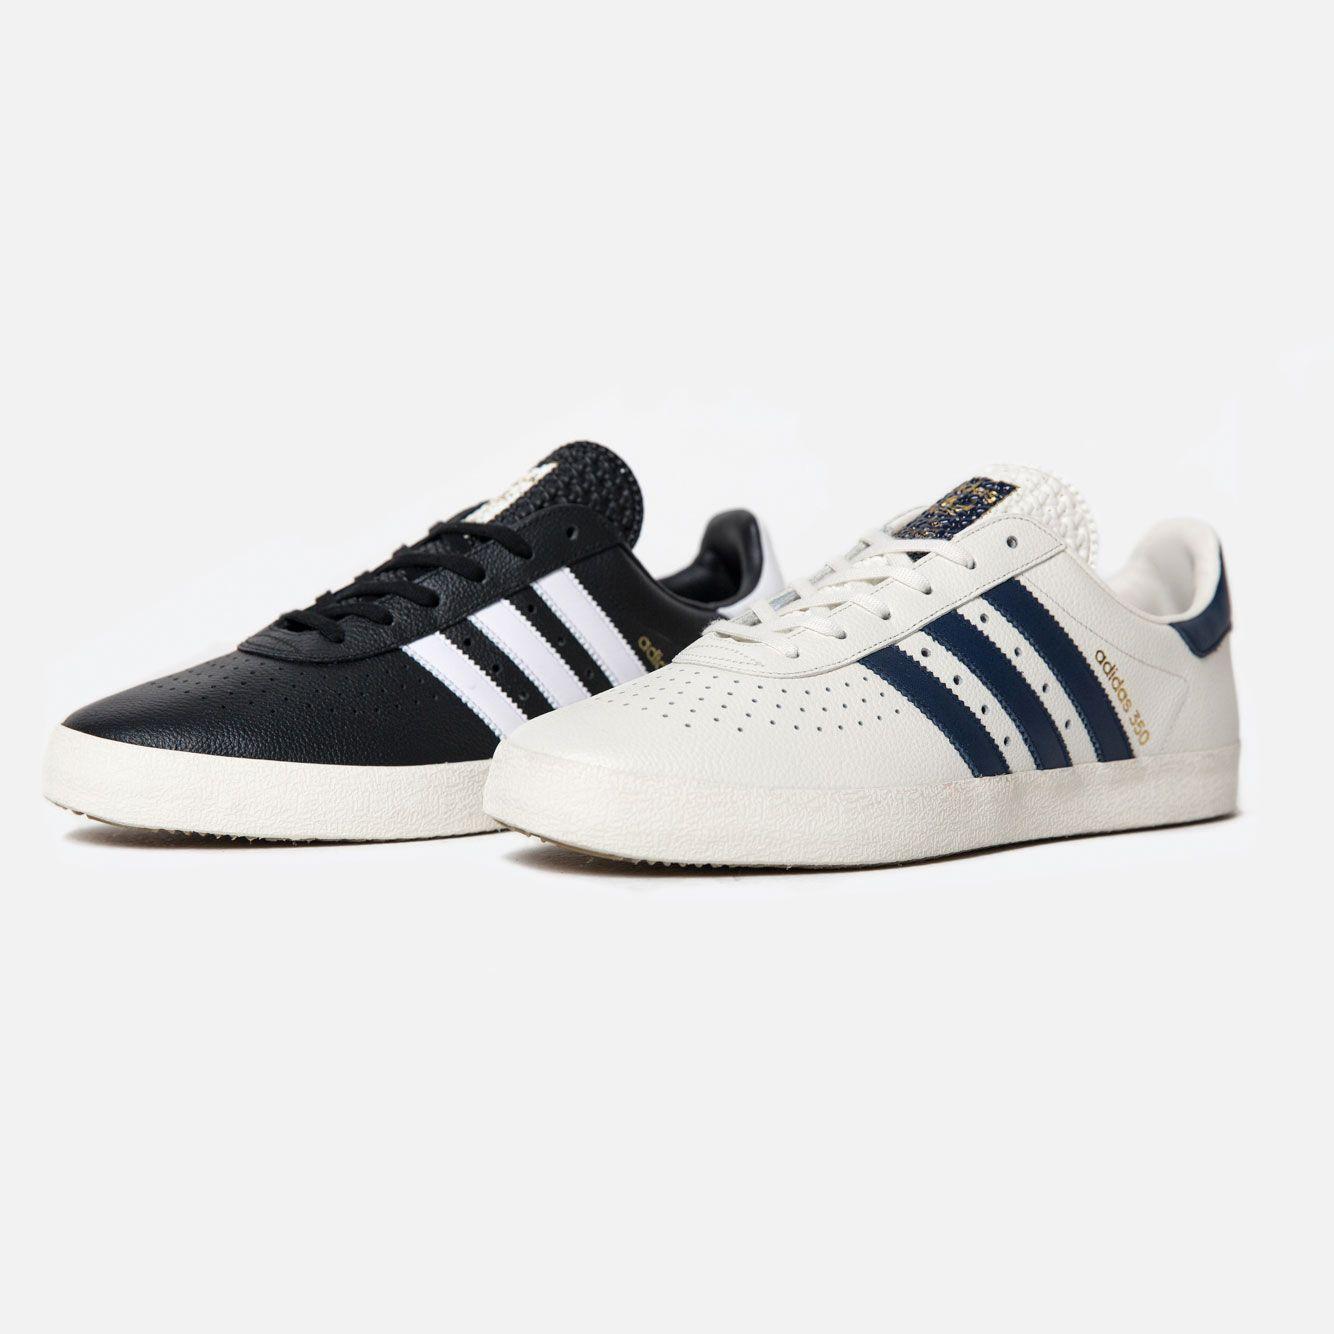 Adidas Originals Spezial 350 Black Gram